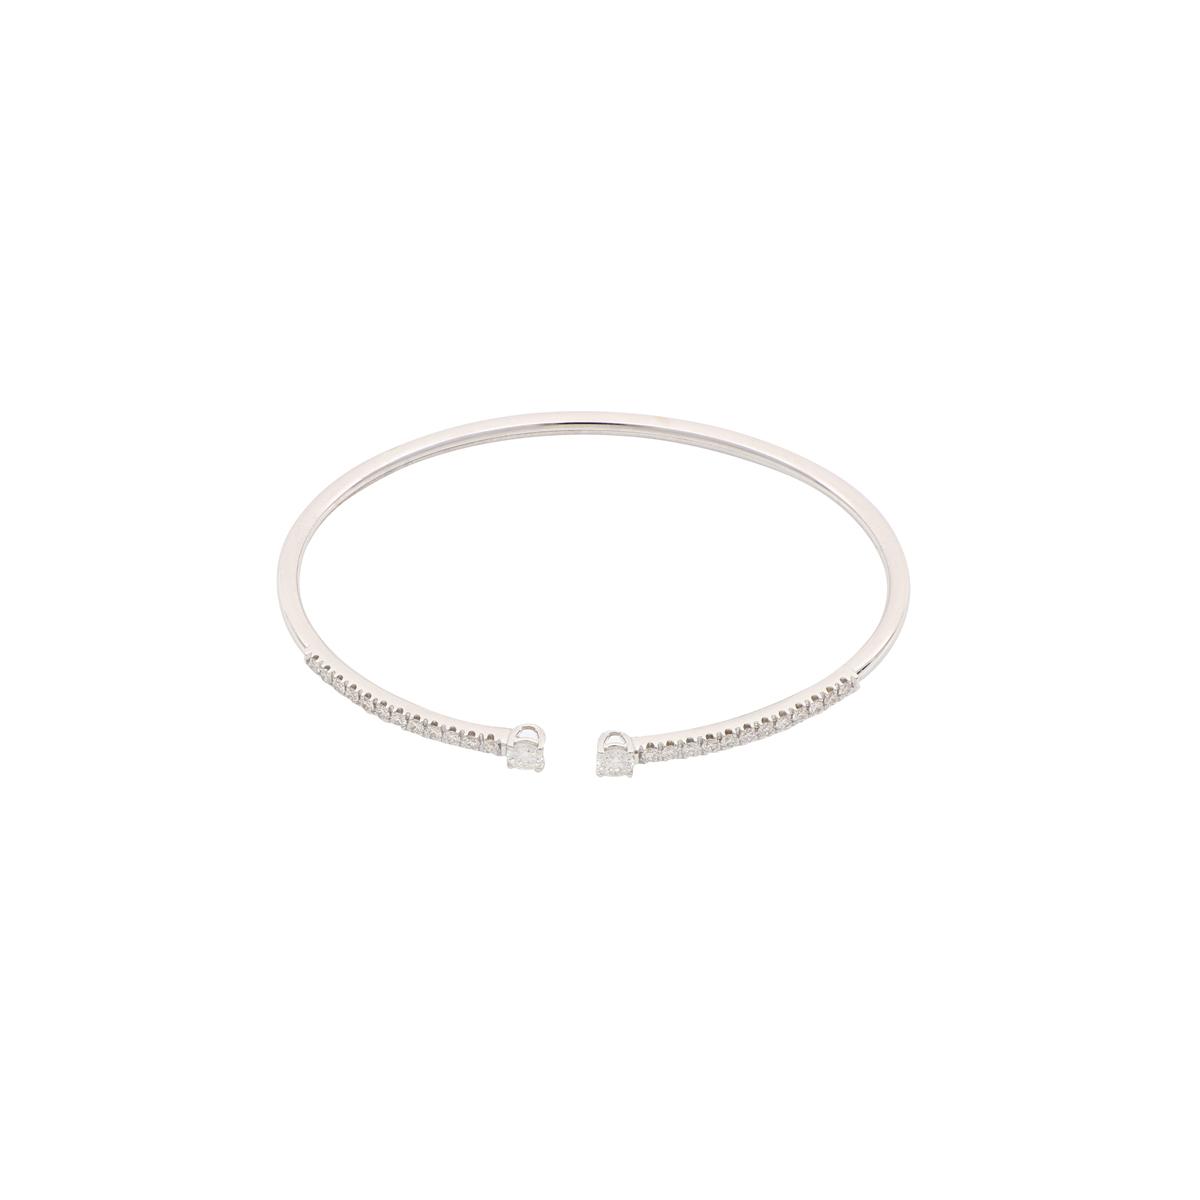 White Gold Diamond Open-Cuff Bangle Bracelet